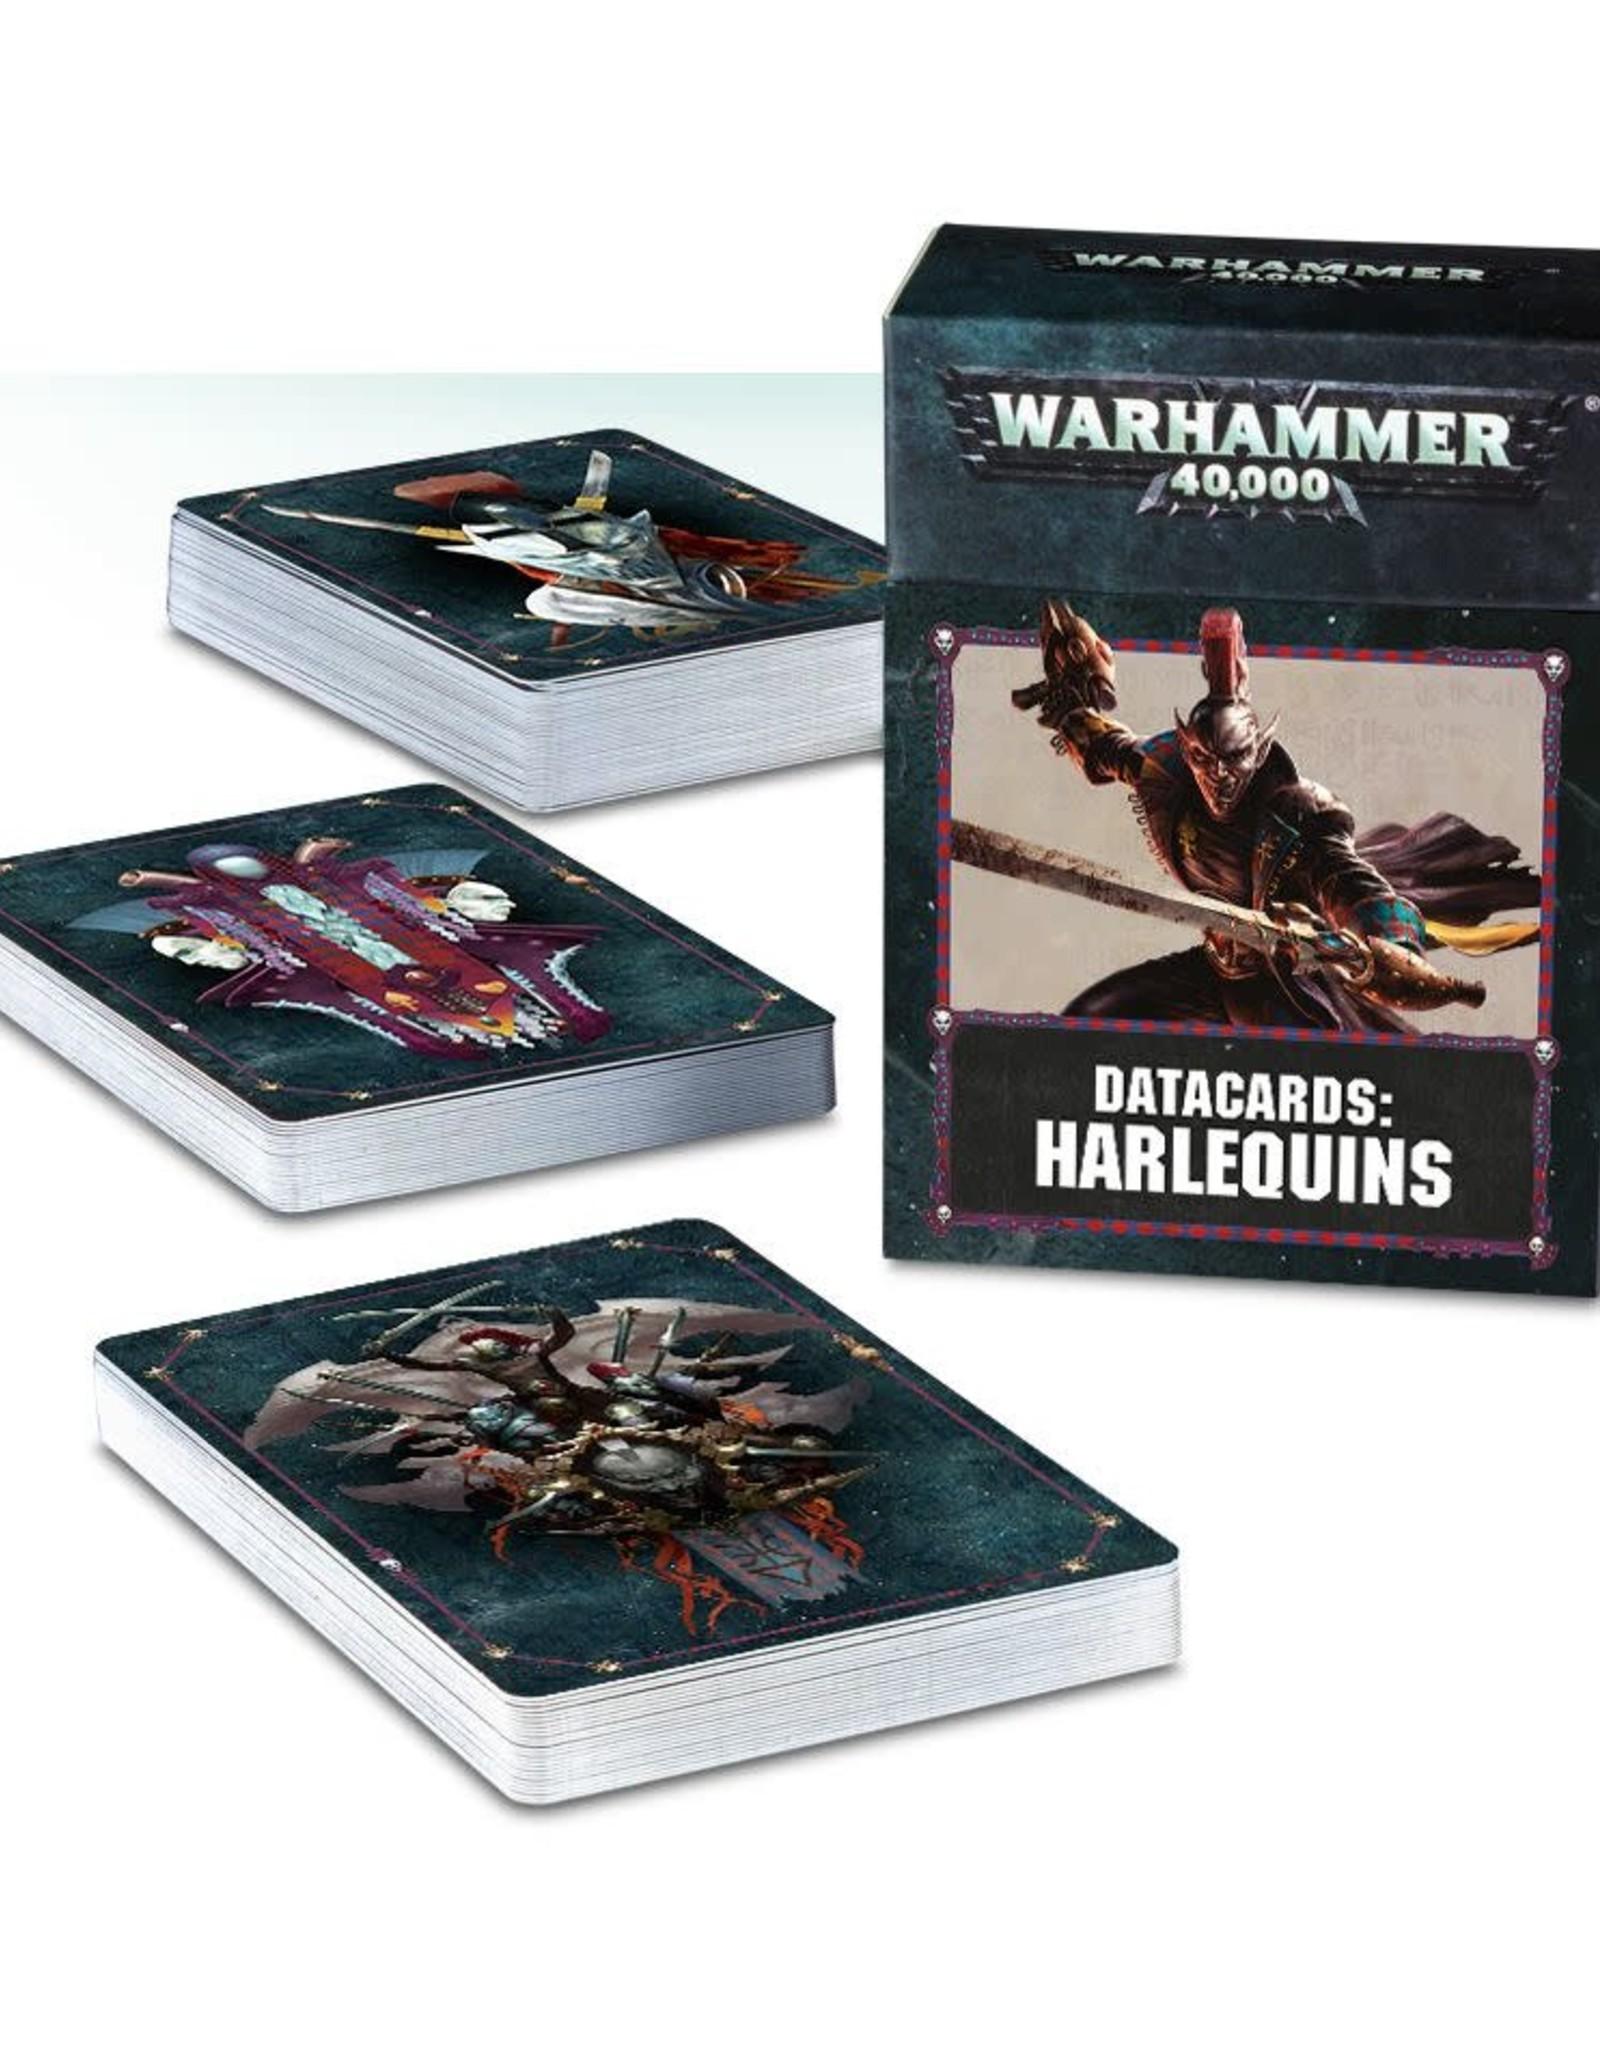 Warhammer 40K Datacards: Harlequins